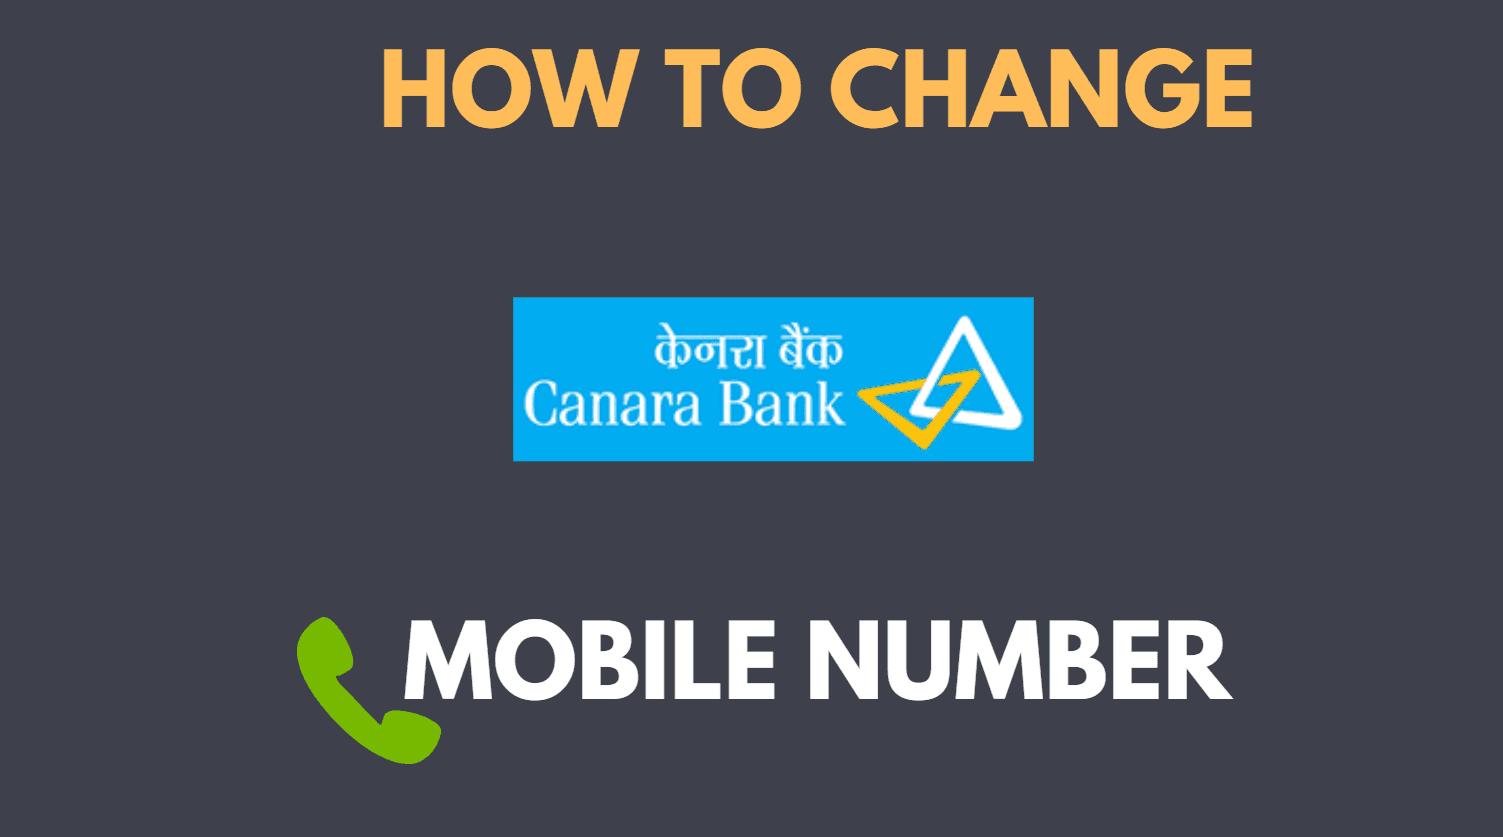 change mobile number in canara bank